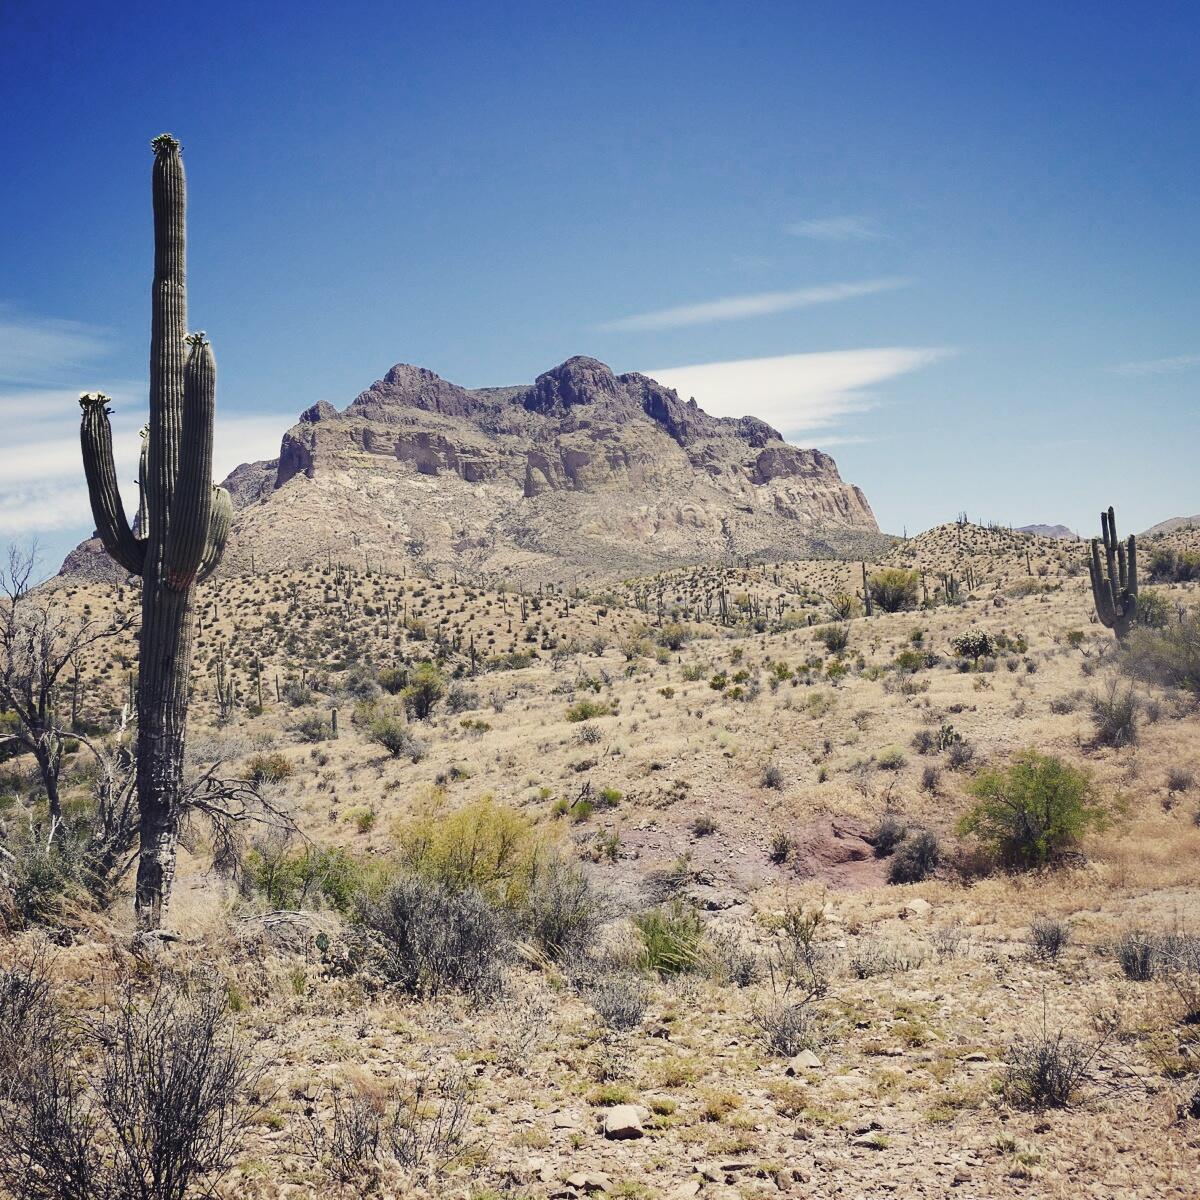 Saguaro cacti dominate the Sonoran desert landscape. Noah Strycker